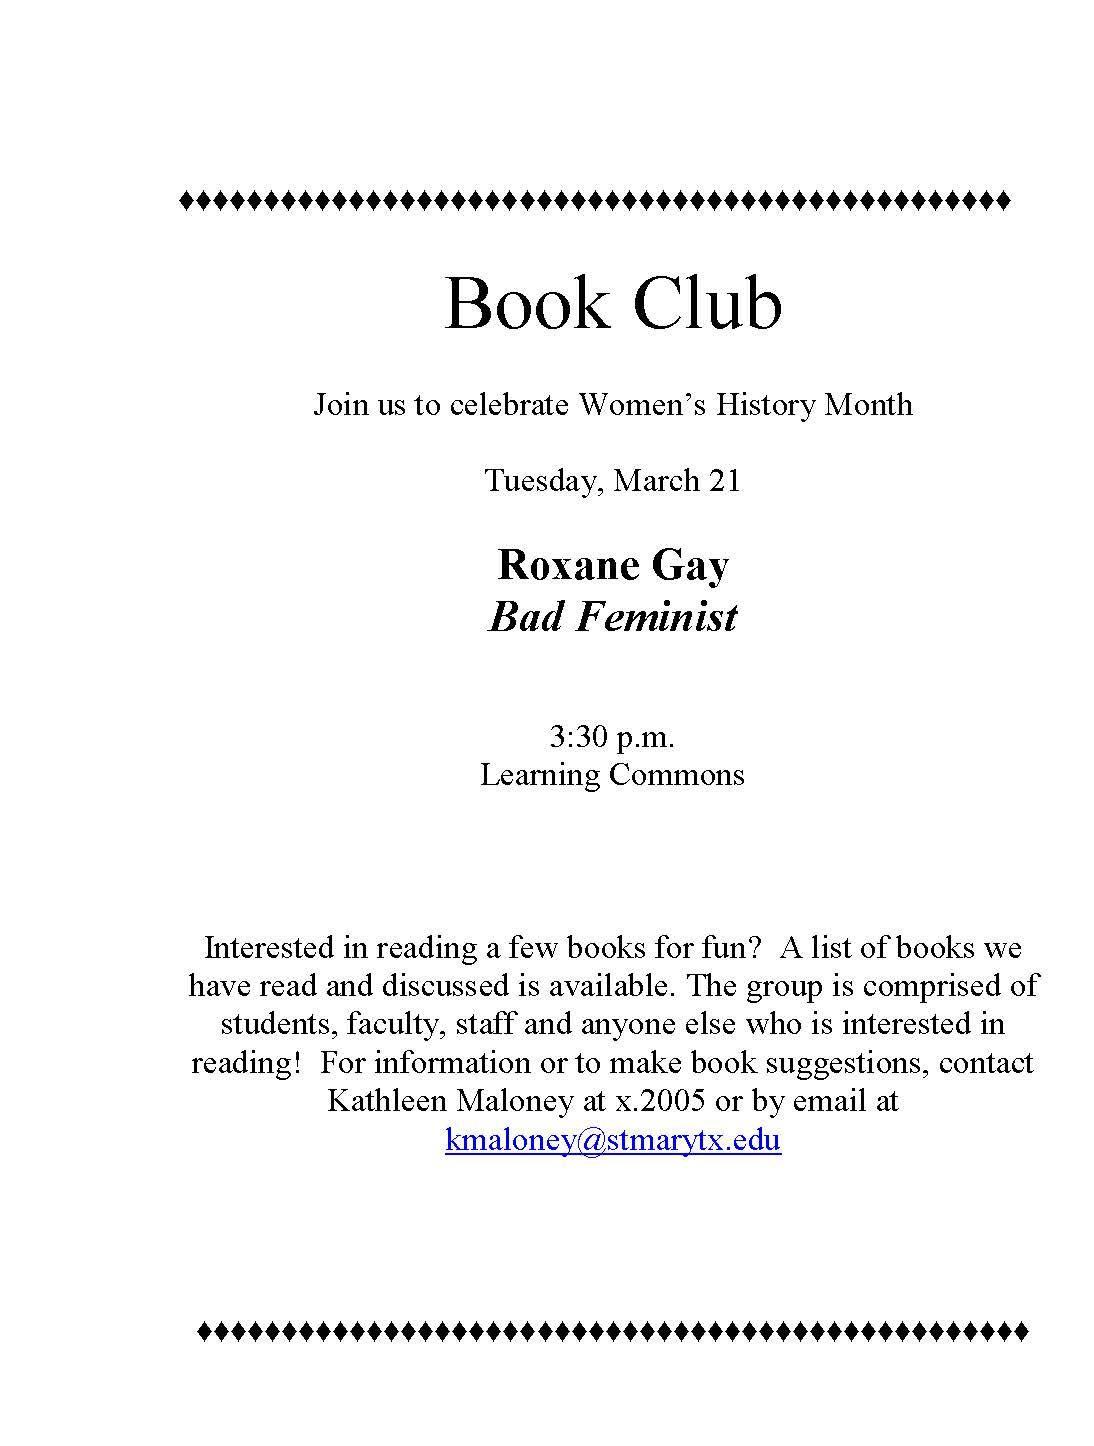 Bad Feminist Book Club Flyer